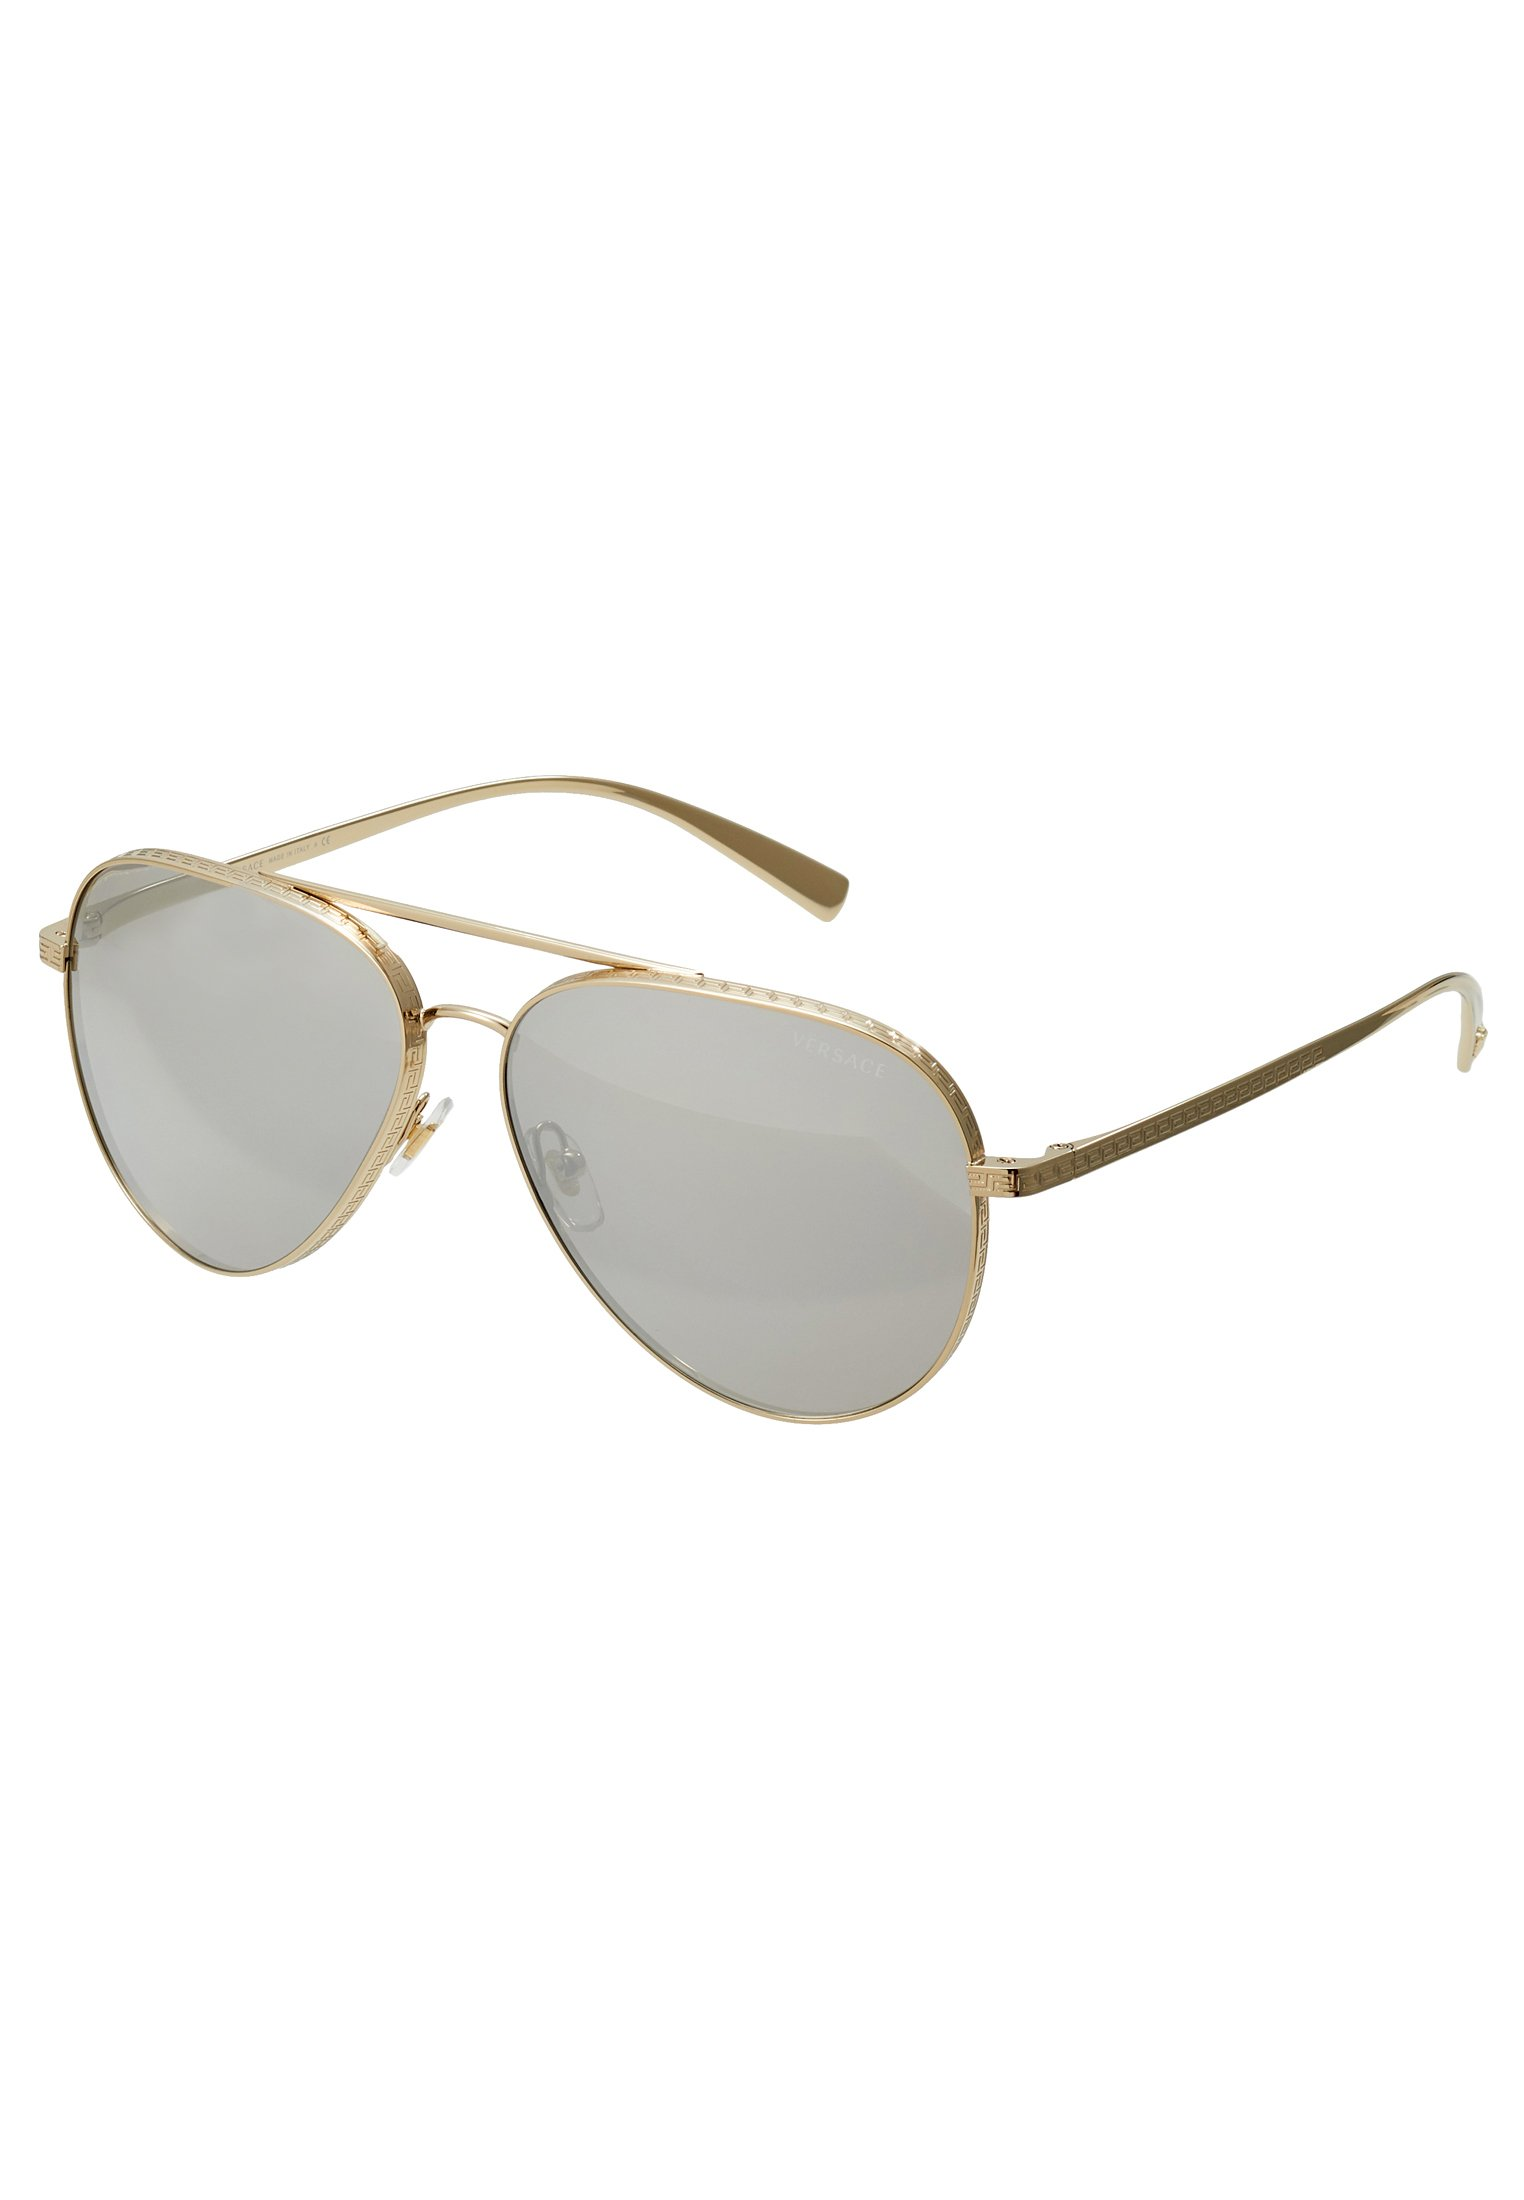 Versace Solbriller - pale gold-coloured/gull 60ketFsE0NJAiwc